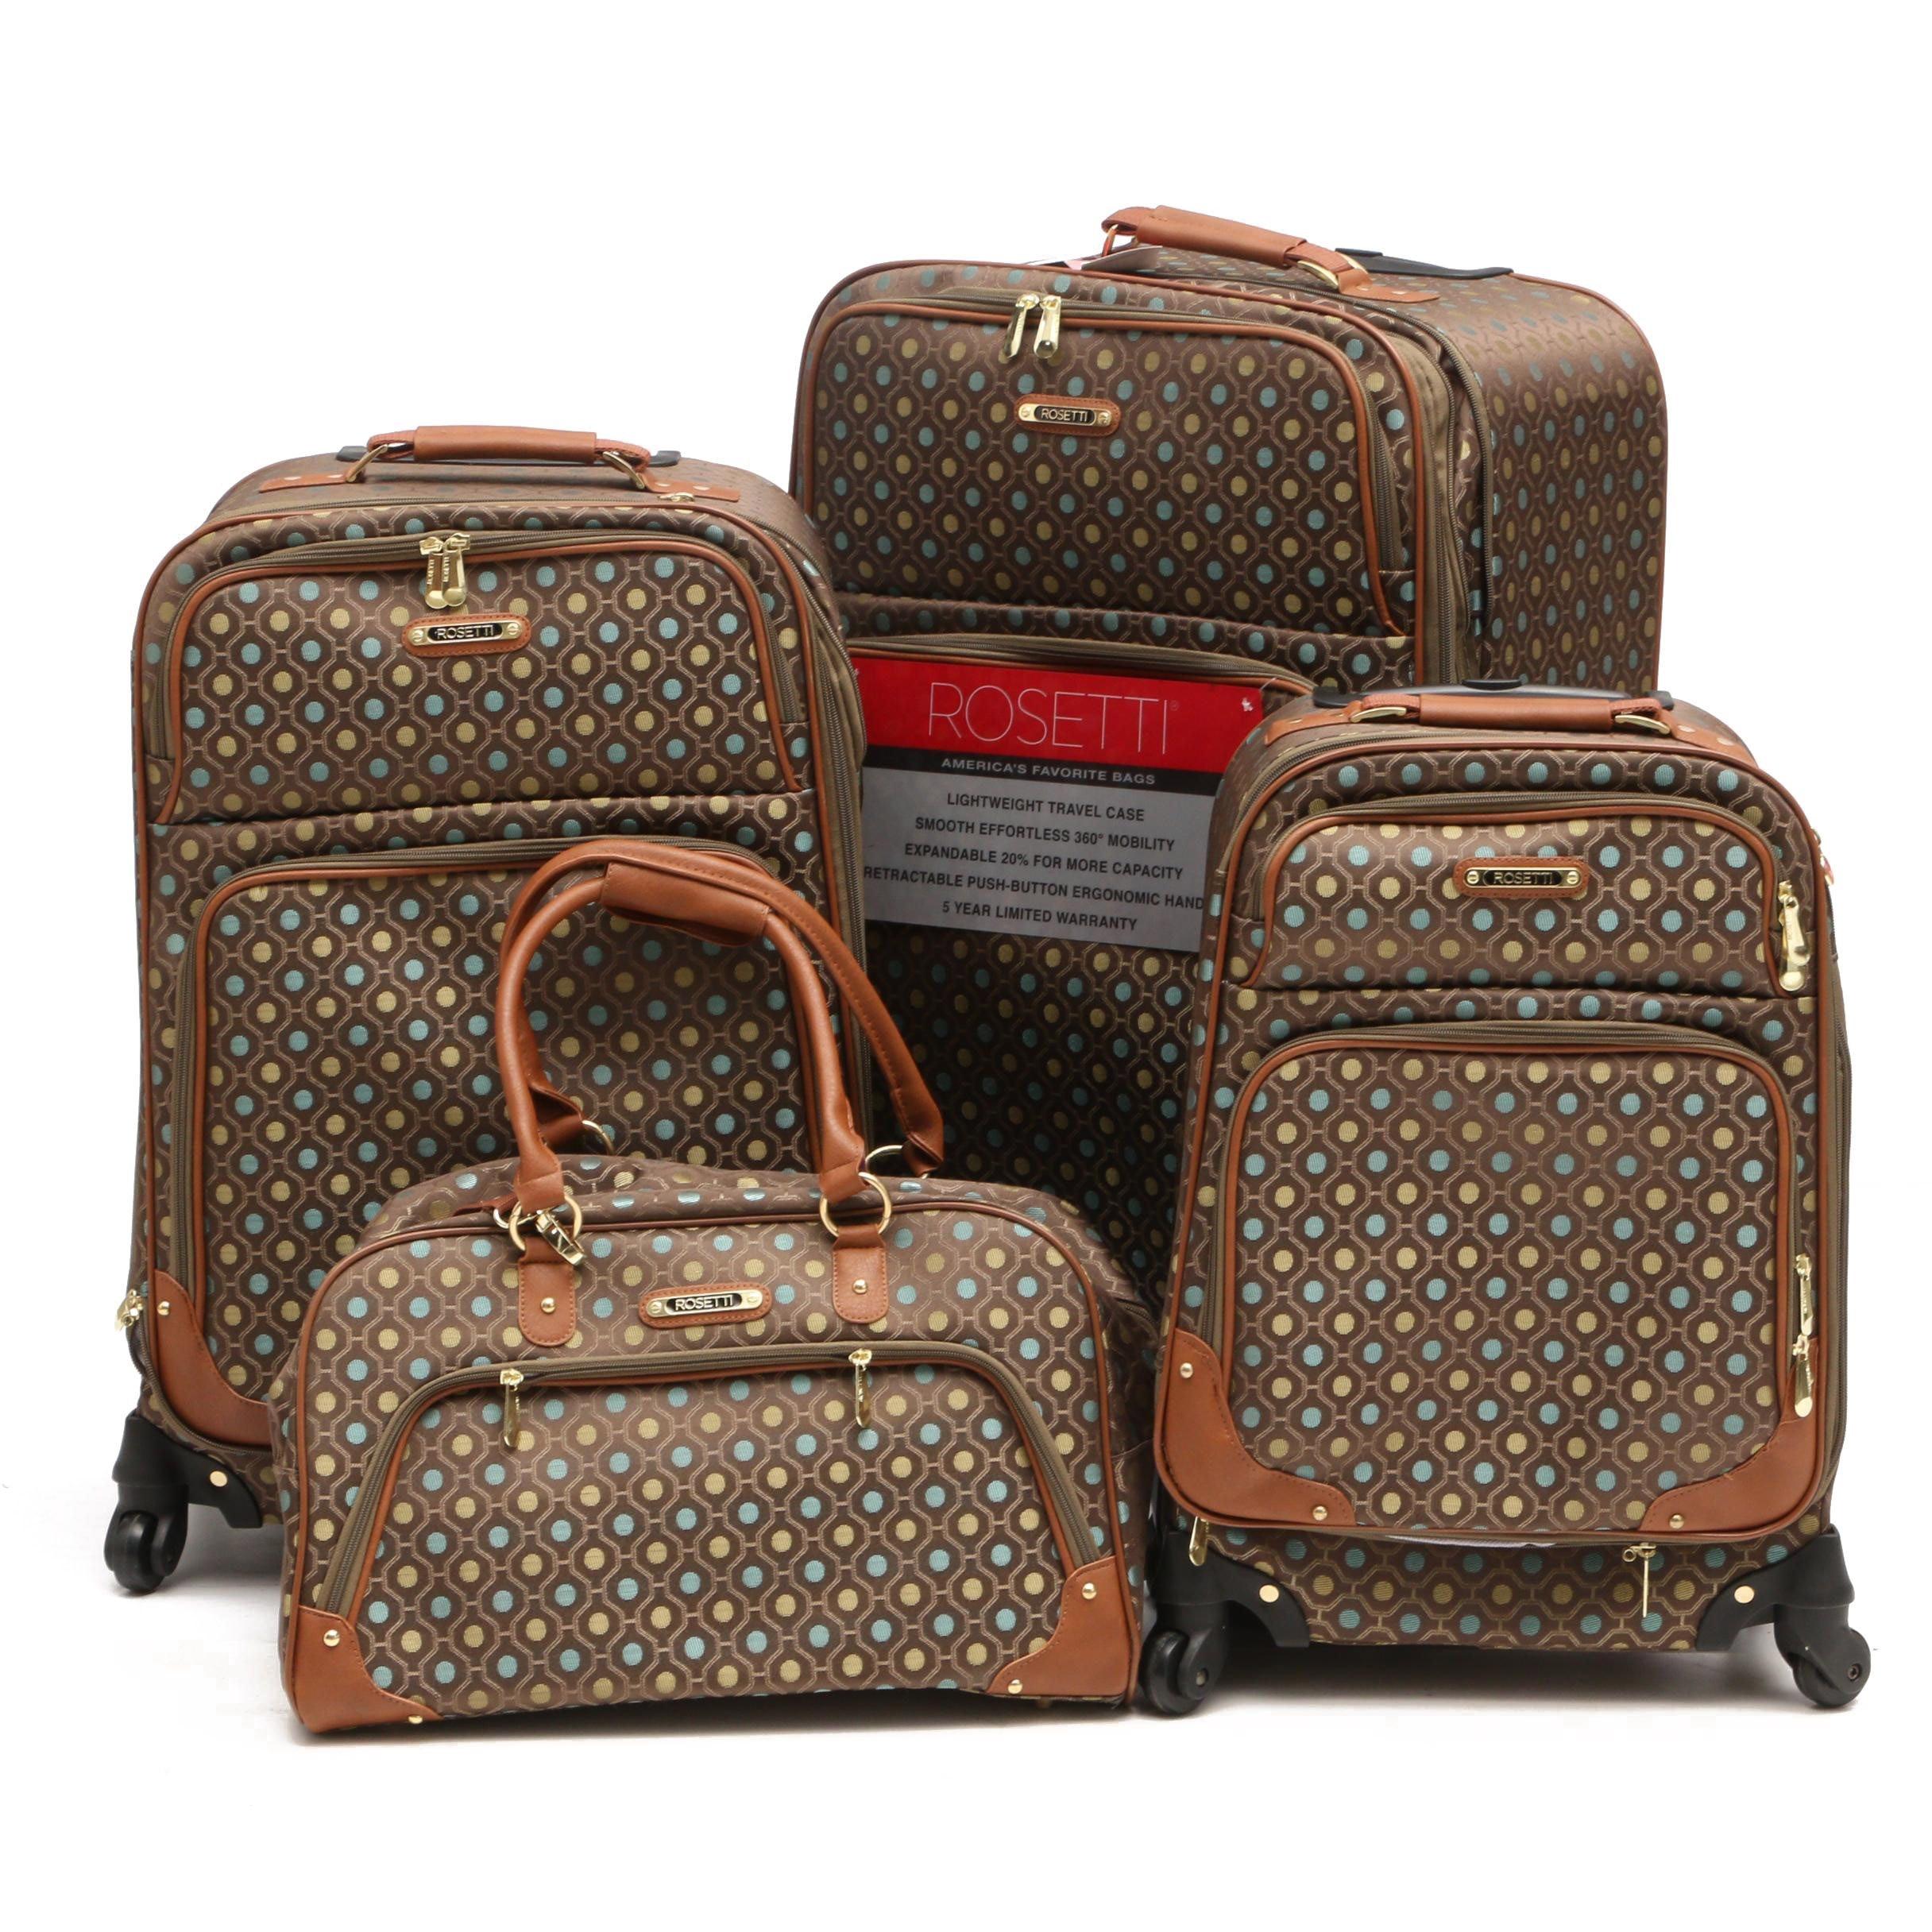 "Rosetti ""Lighten up Collection"" Luggage Set"